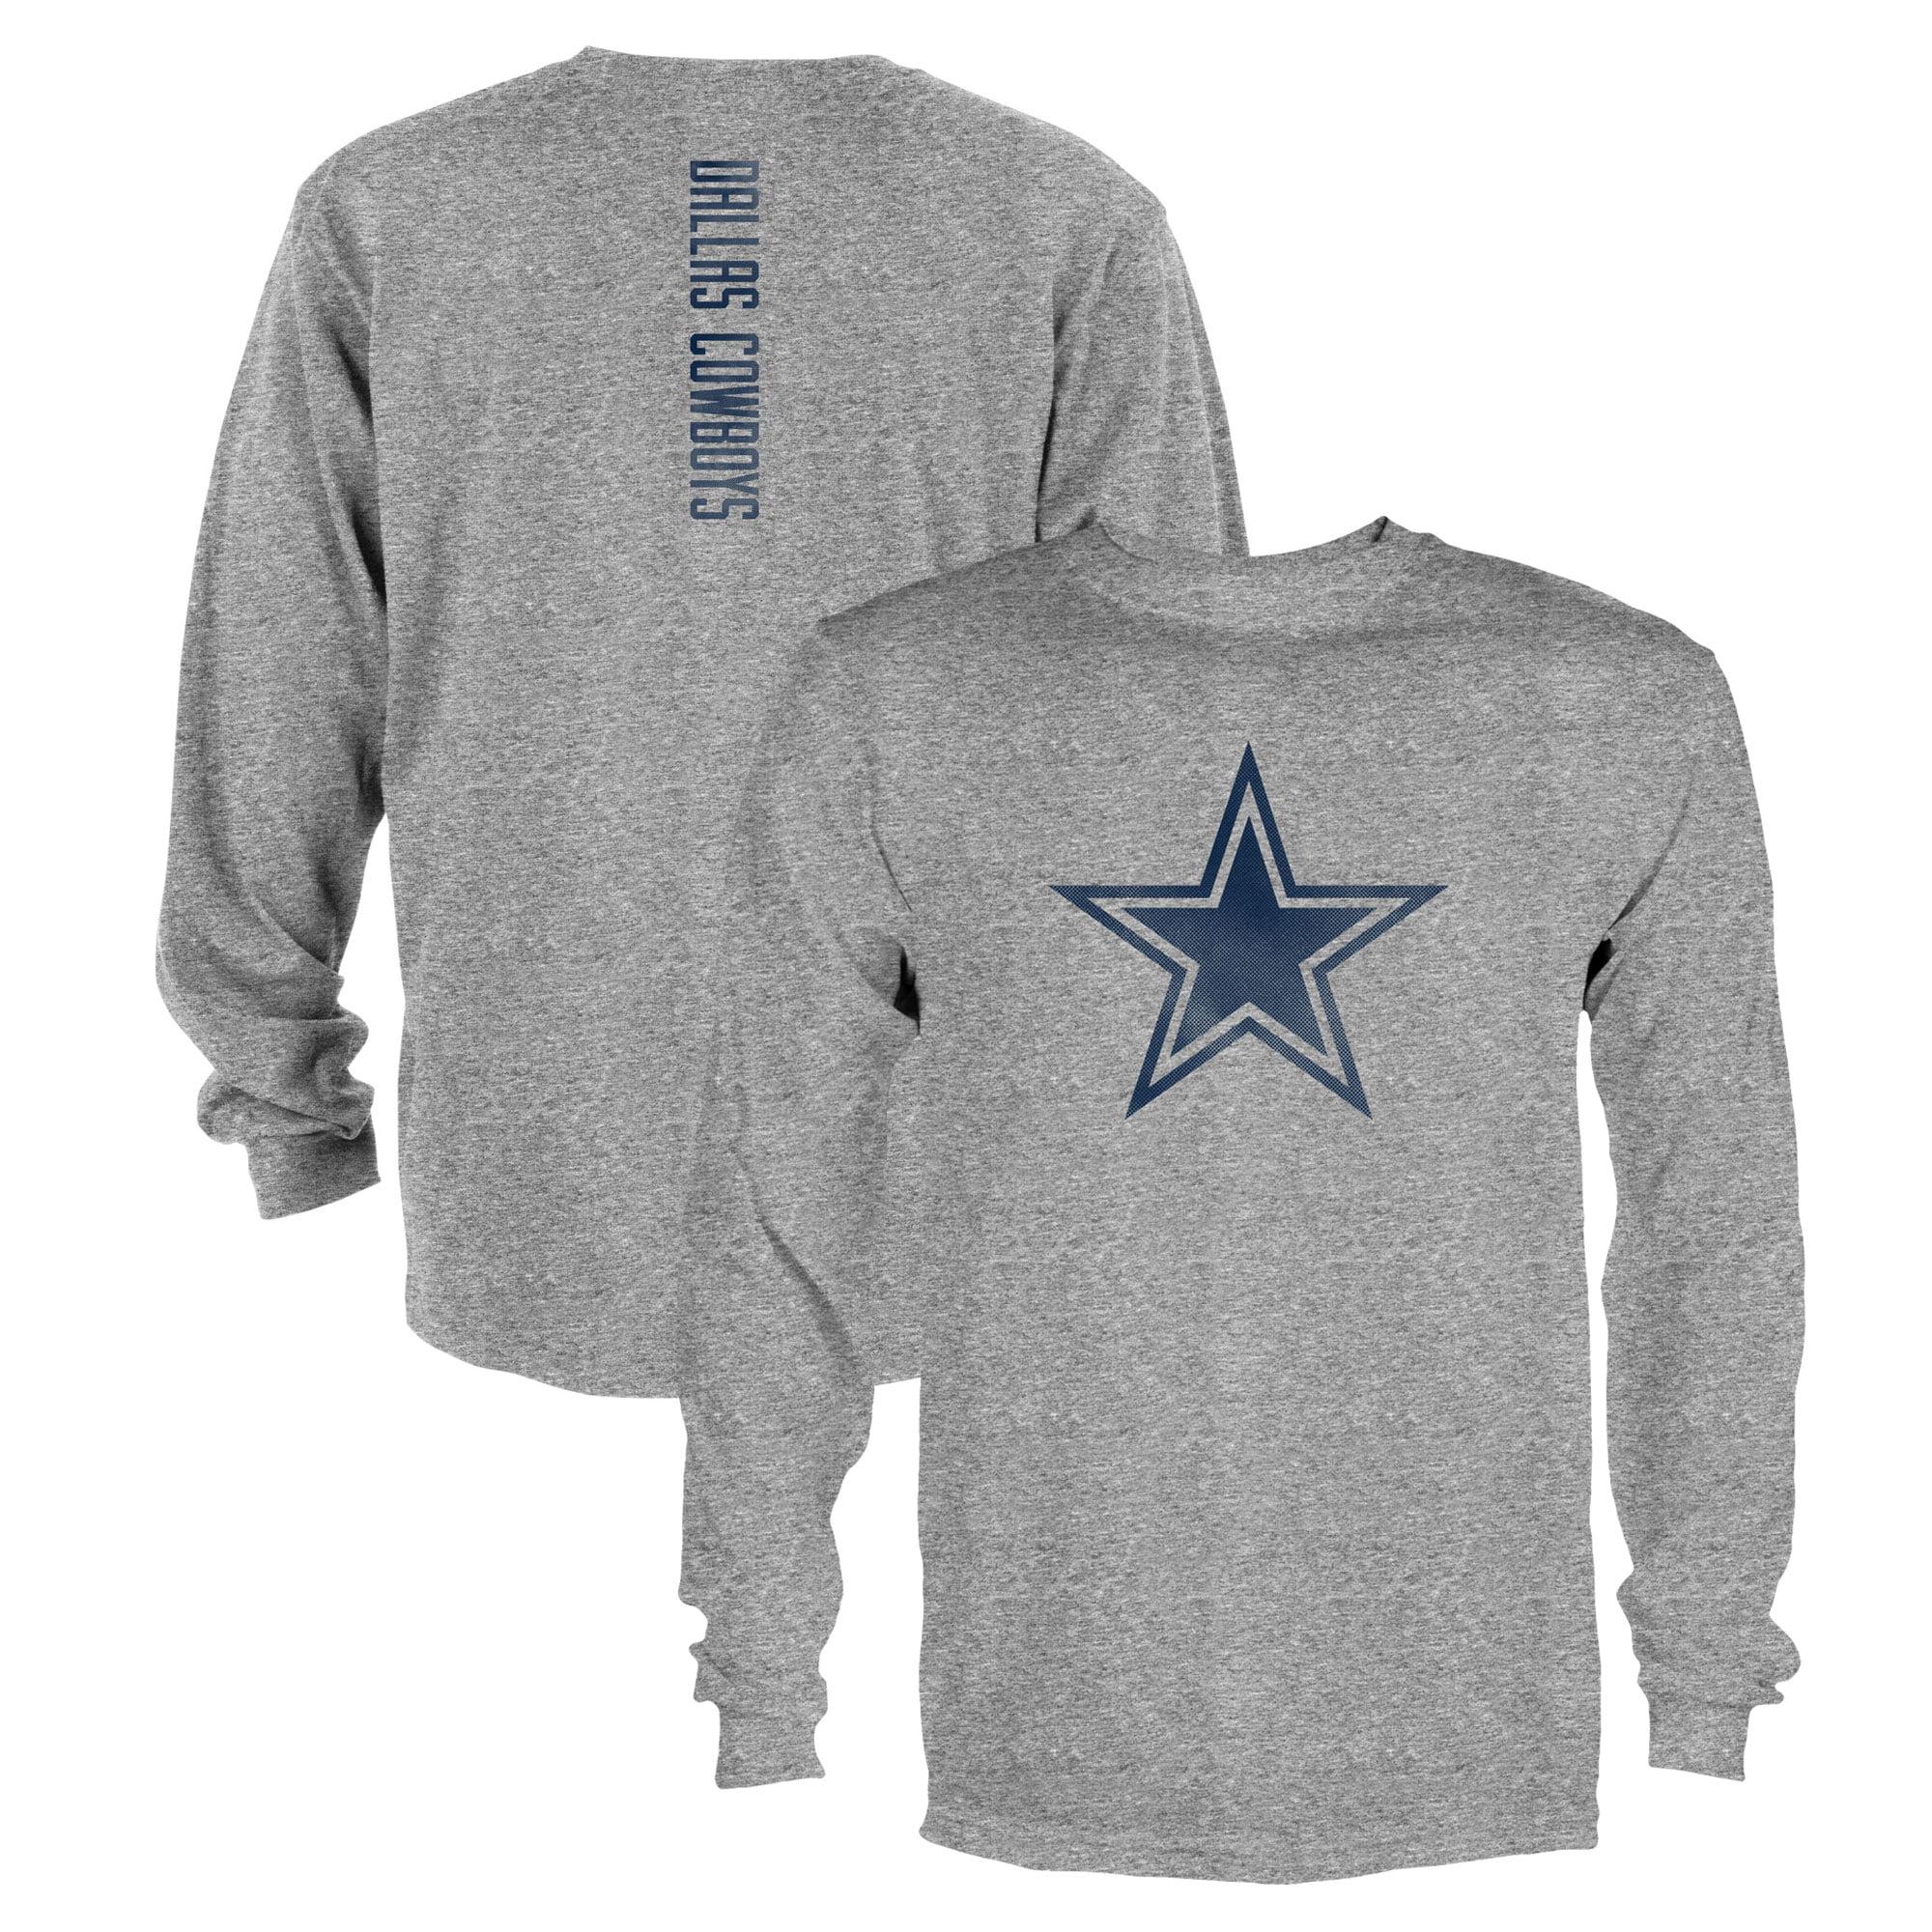 Men's Heathered Gray Dallas Cowboys Swiss Long Sleeve T-Shirt